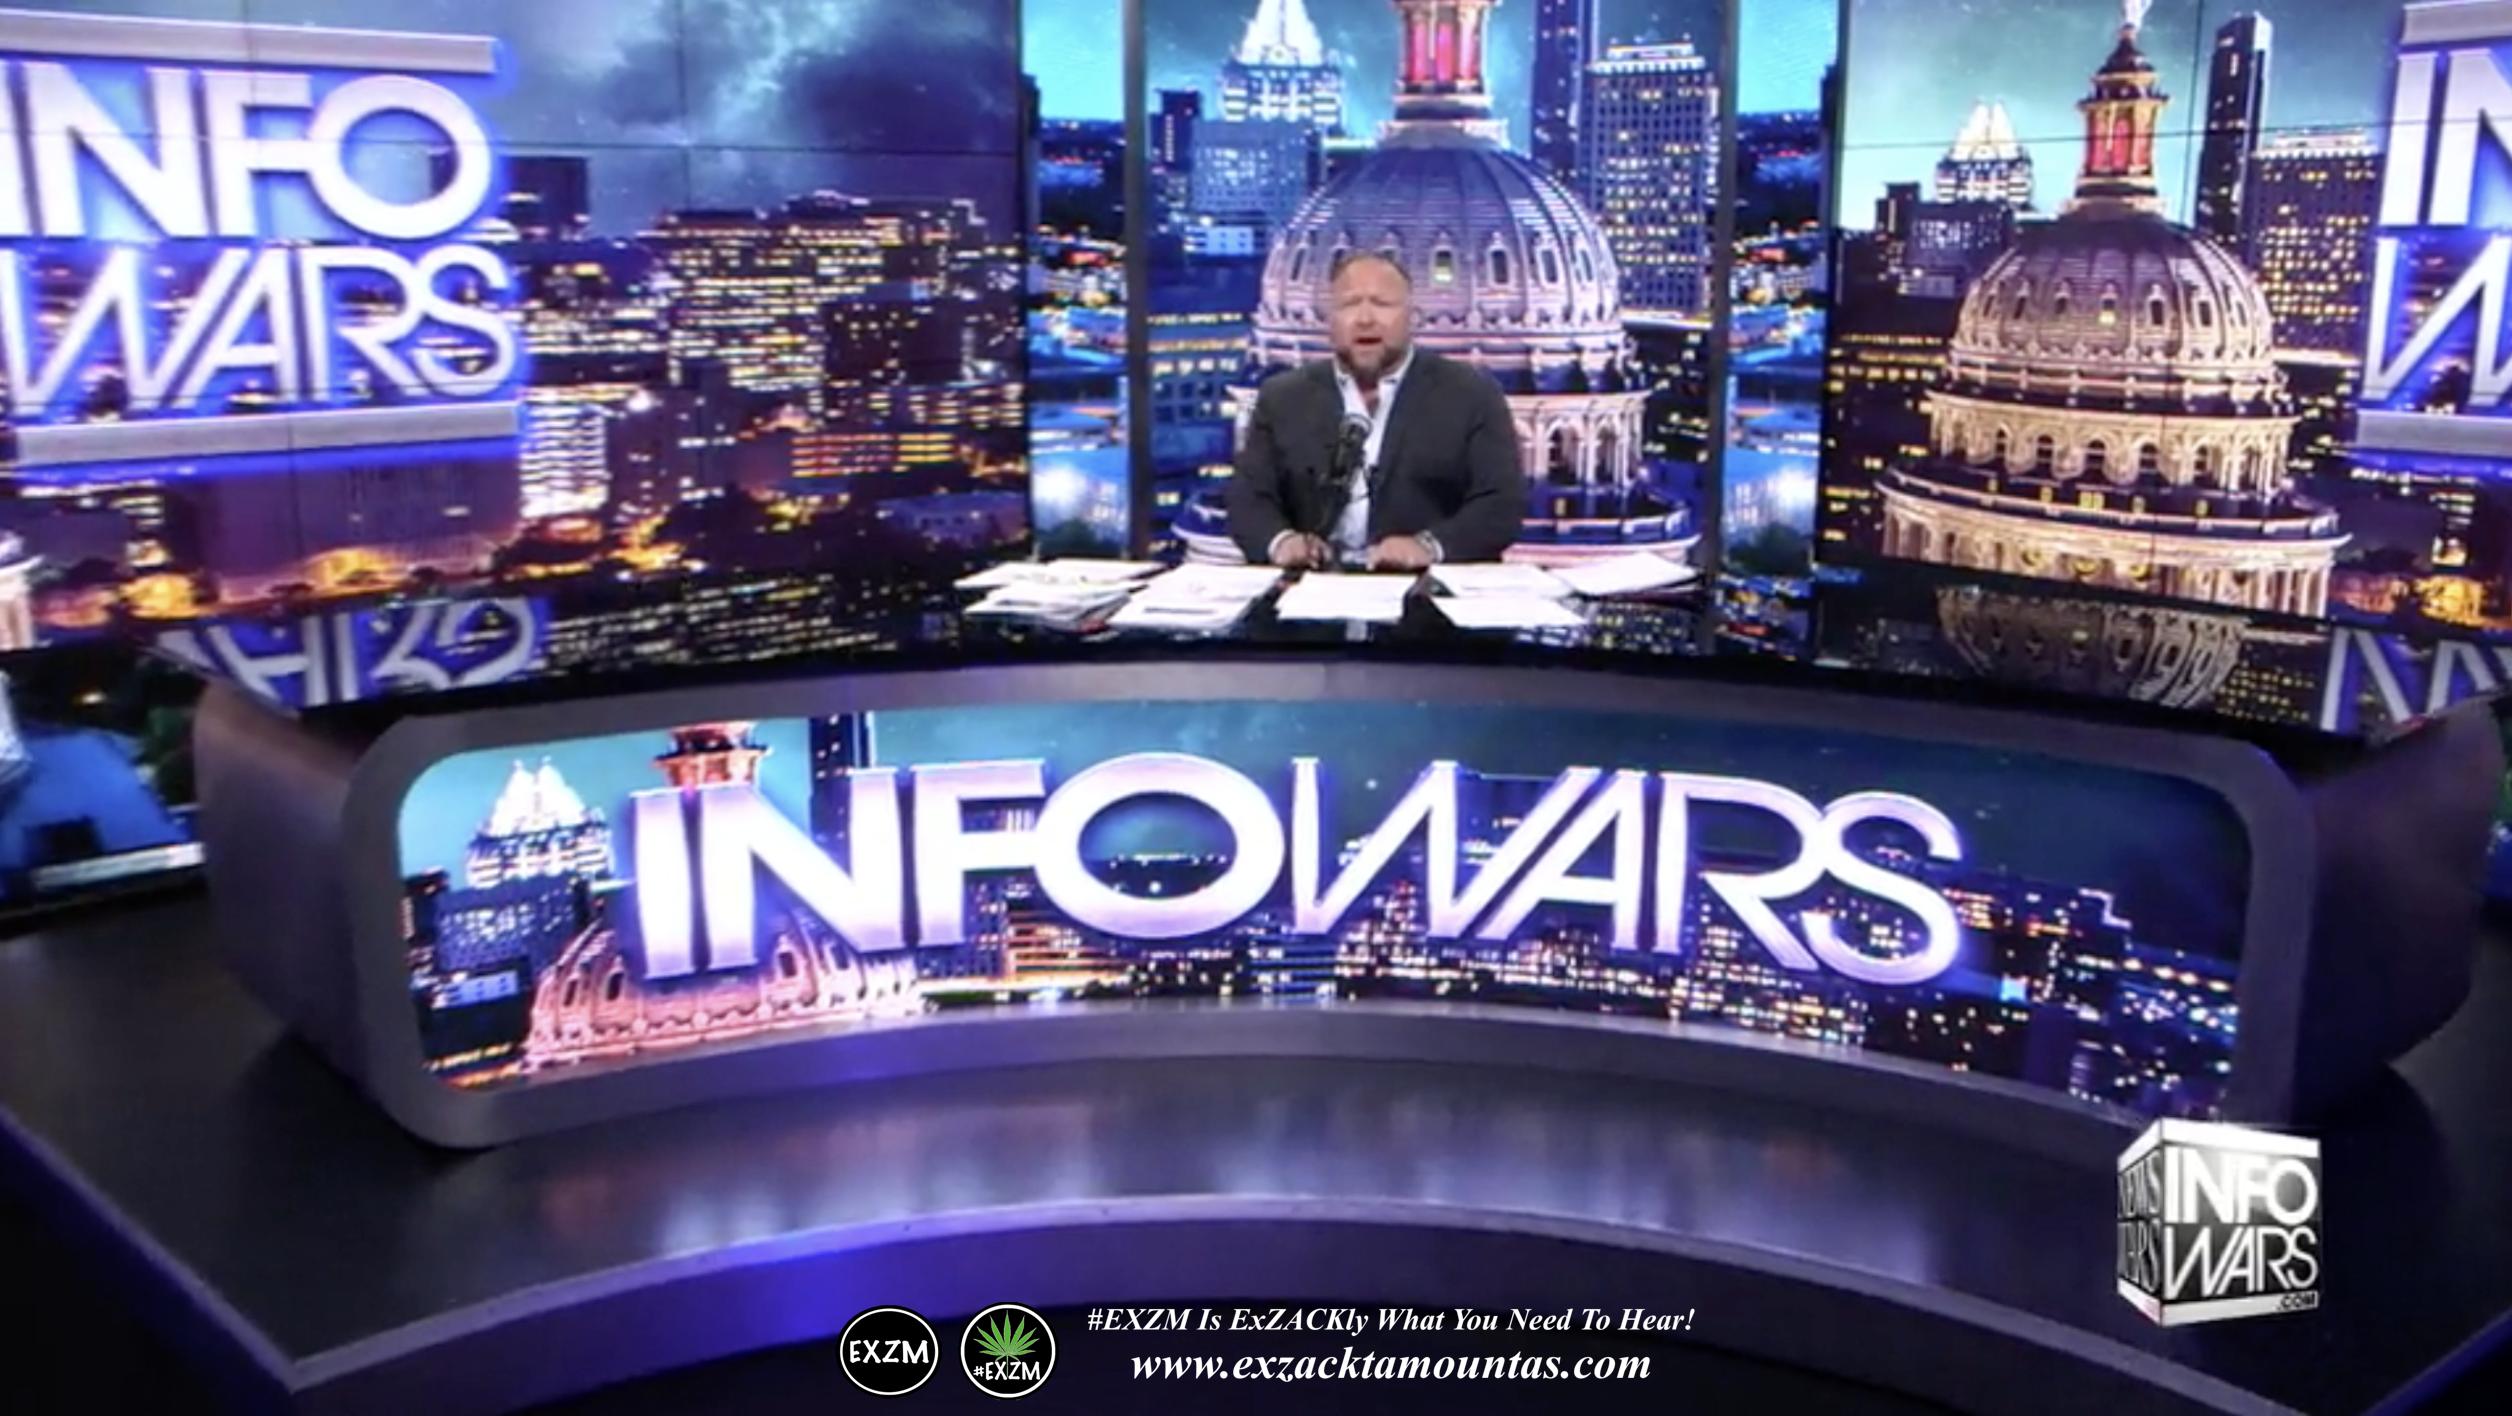 Alex Jones Live Infowars Studio EXZM Zack Mount March 16th 2021 copy